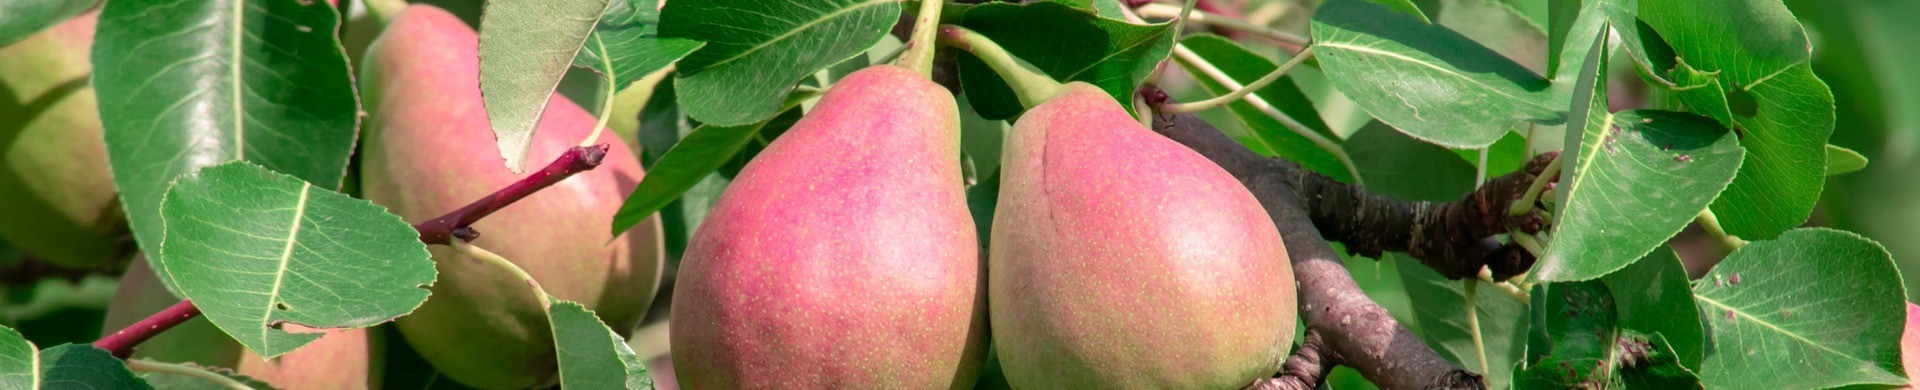 Plantar perales - Comprar perales